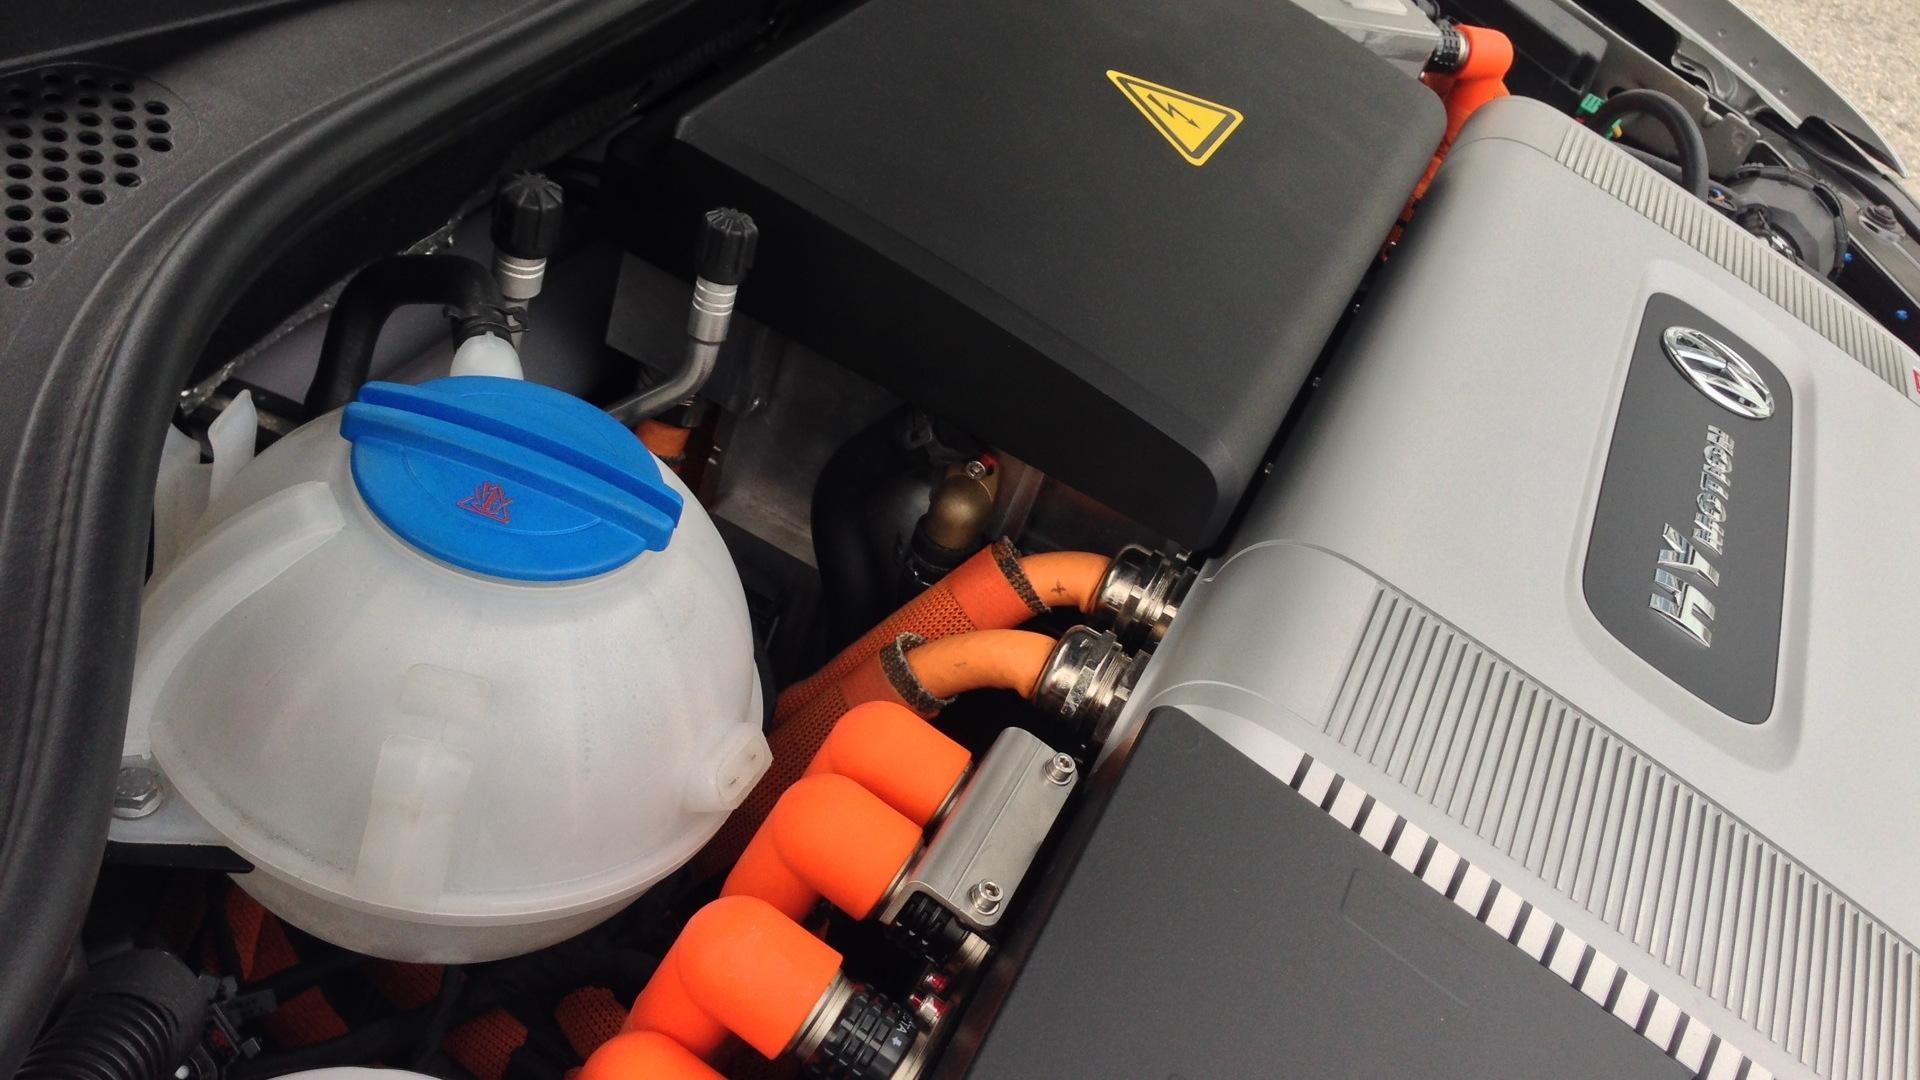 Volkswagen Passat HyMotion hydrogen fuel cell prototype  -  Los Angeles, November 2014